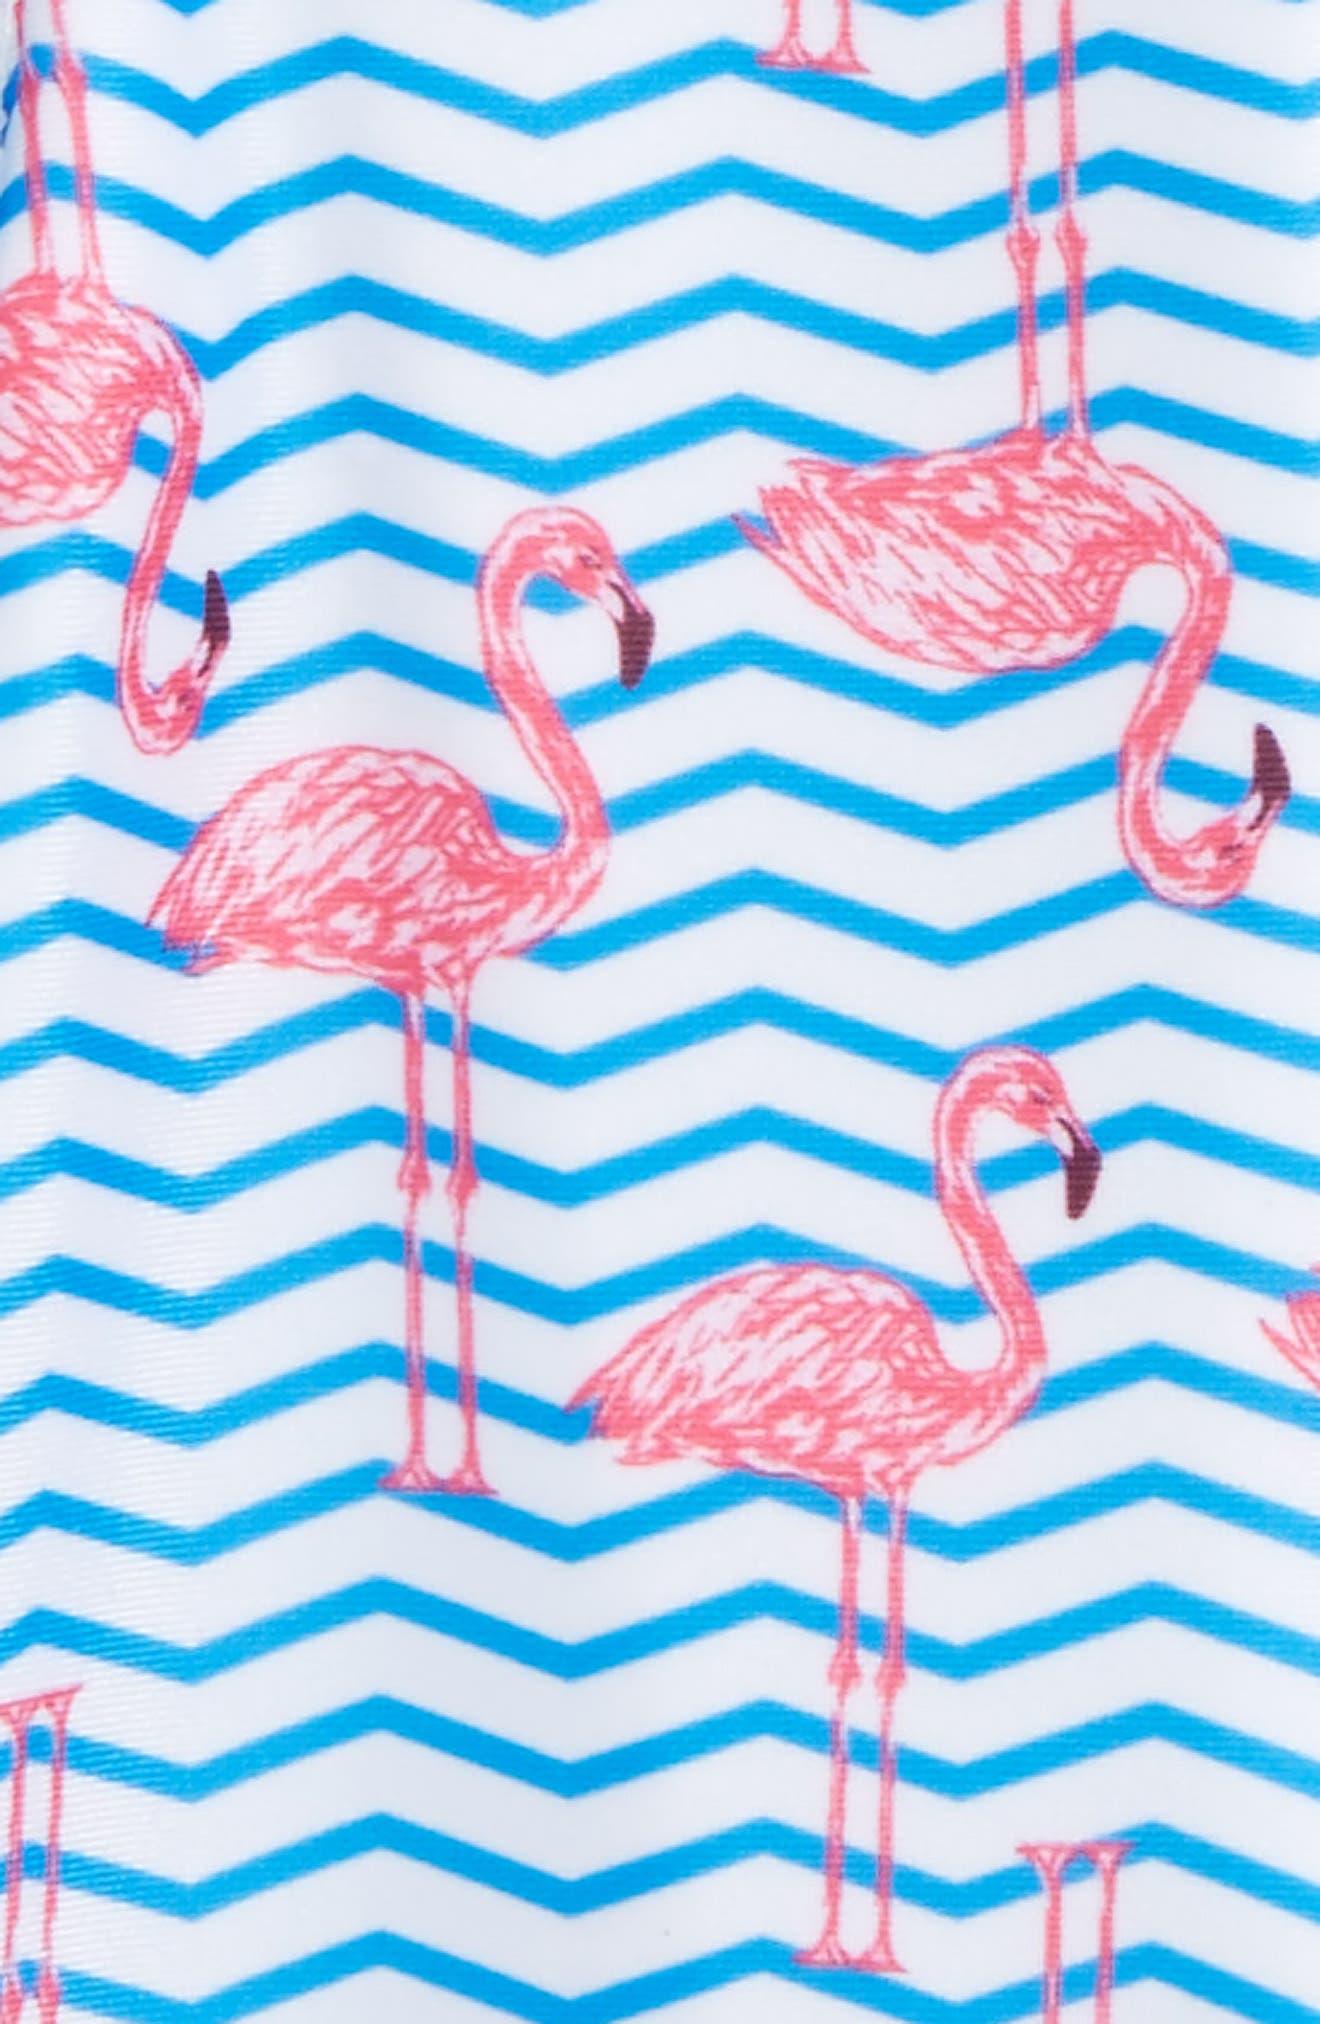 Zigzag Flamingos One-Piece Rashguard Swimsuit,                             Alternate thumbnail 2, color,                             439